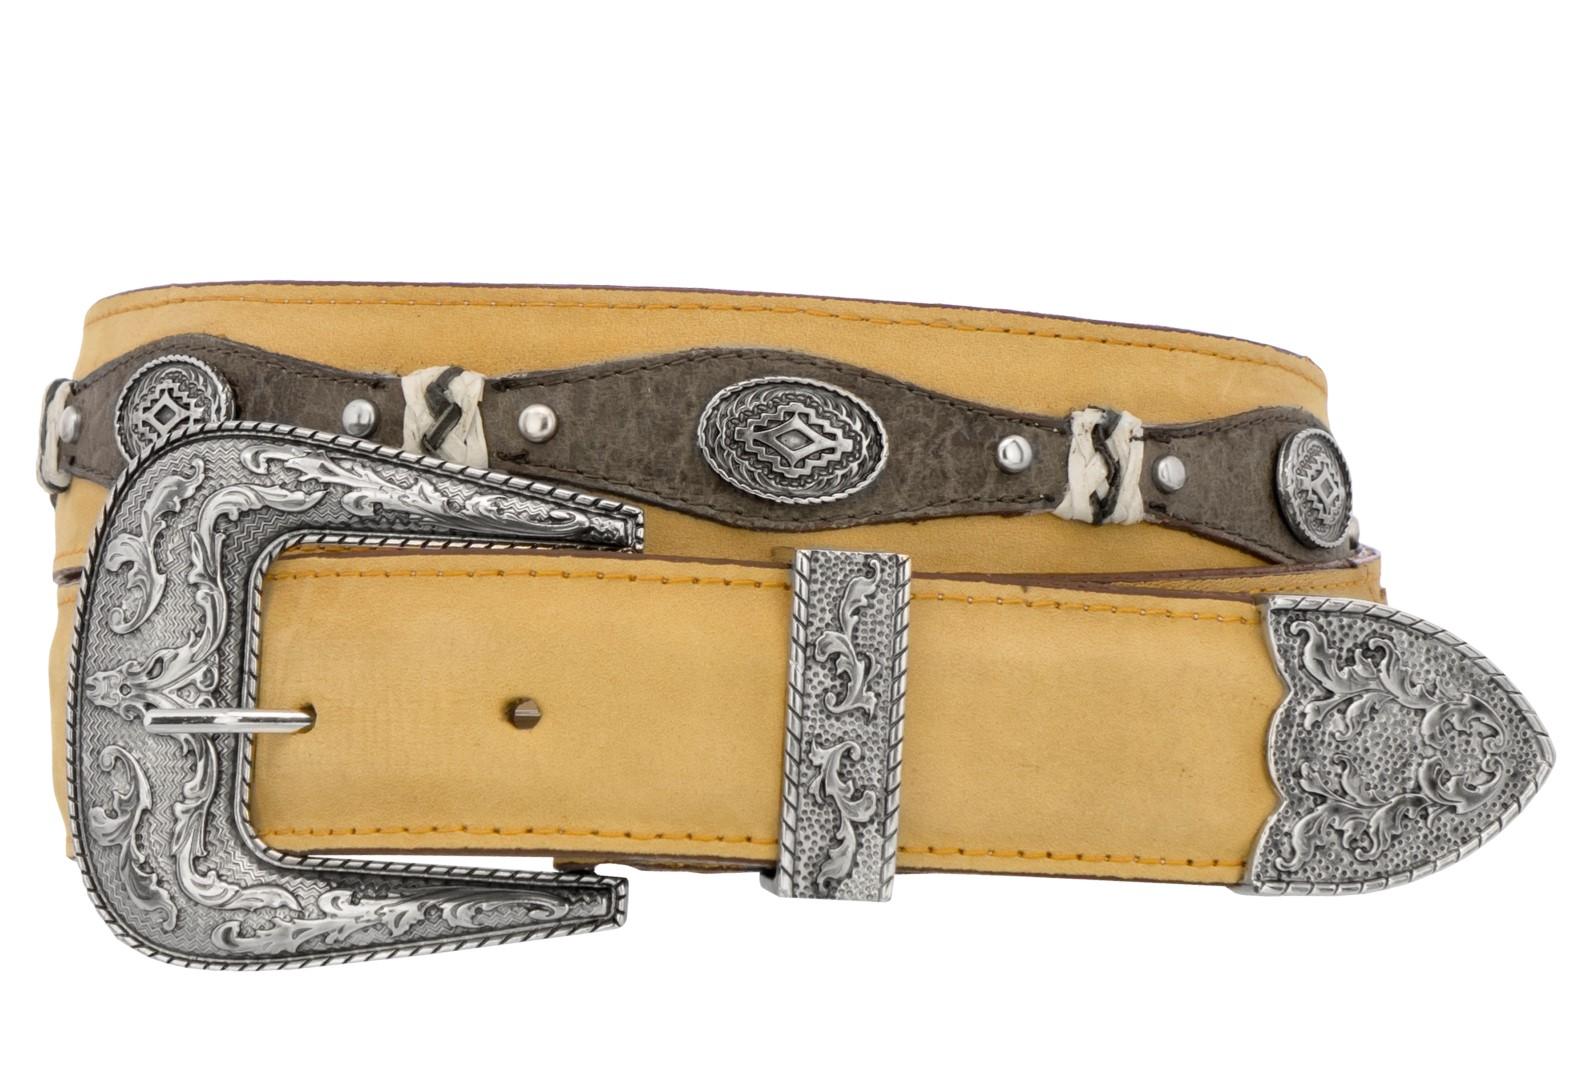 Mens-Concho-Western-Belt-Genuine-Leather-Cowboy-Silver-Studs-Buckle-Sand